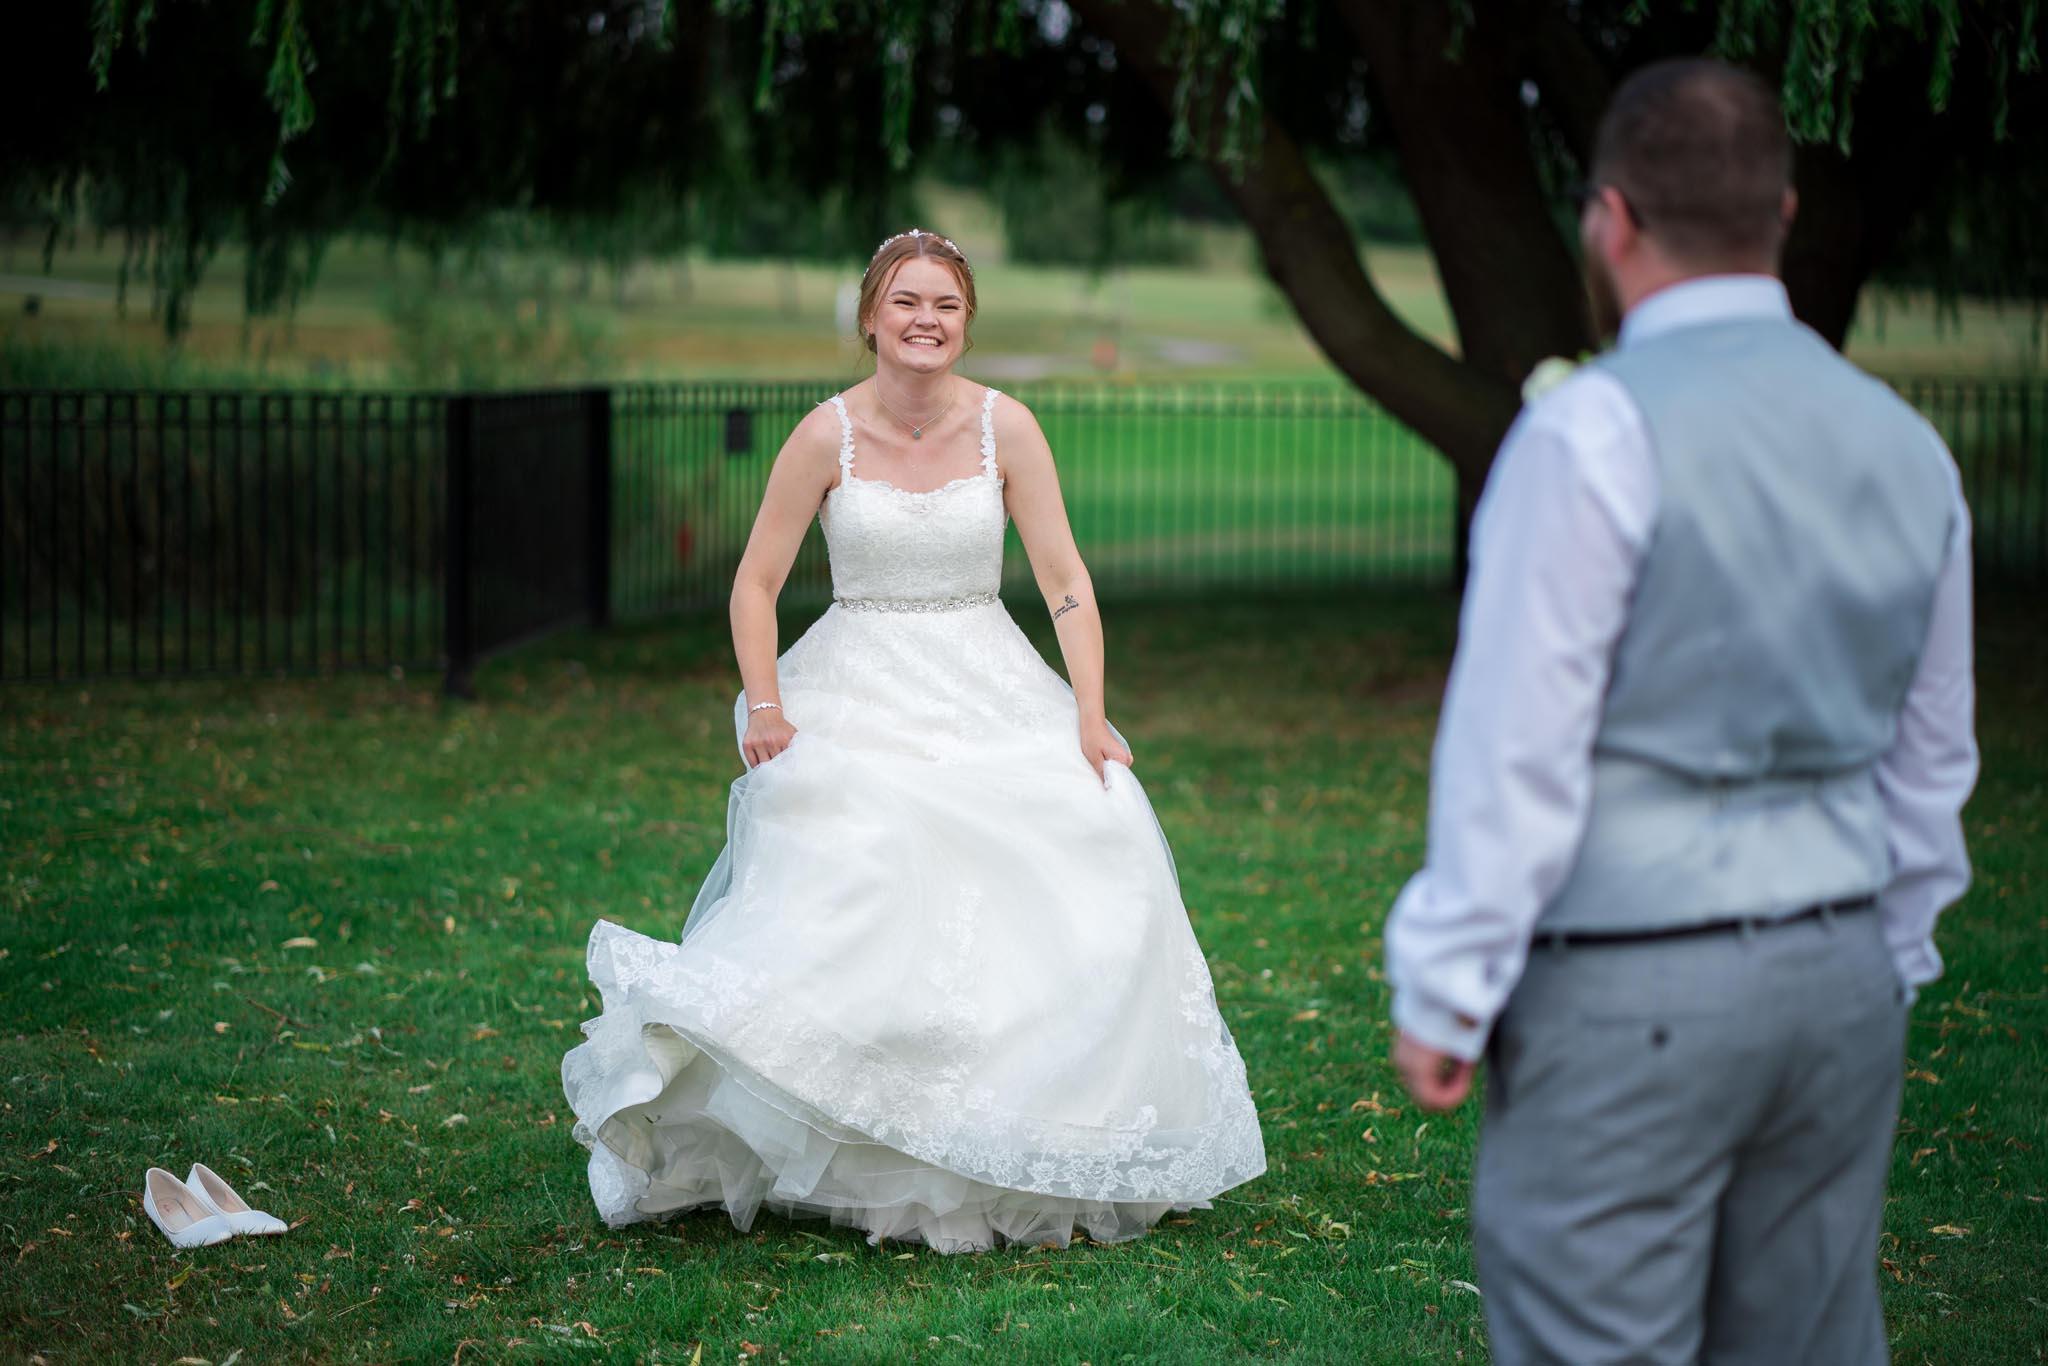 589-Bride-groom-Luke-Yasmin-The-Rayleigh-Club-Wedding-Photography.jpg